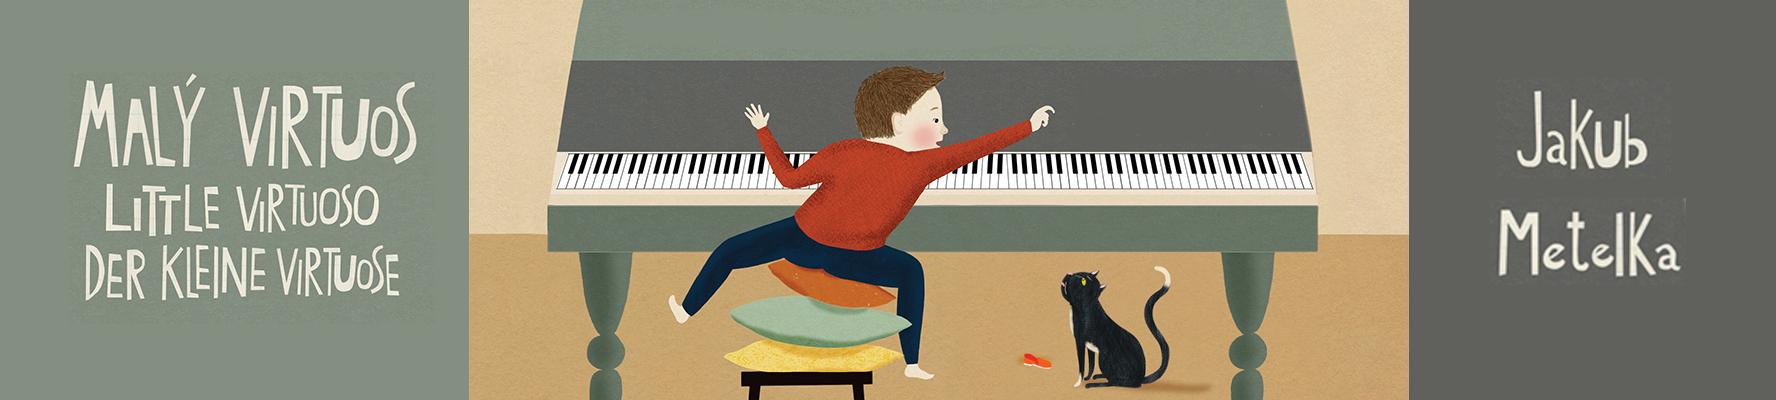 Jakub Metelka | Malý virtuos | noty pro klavír